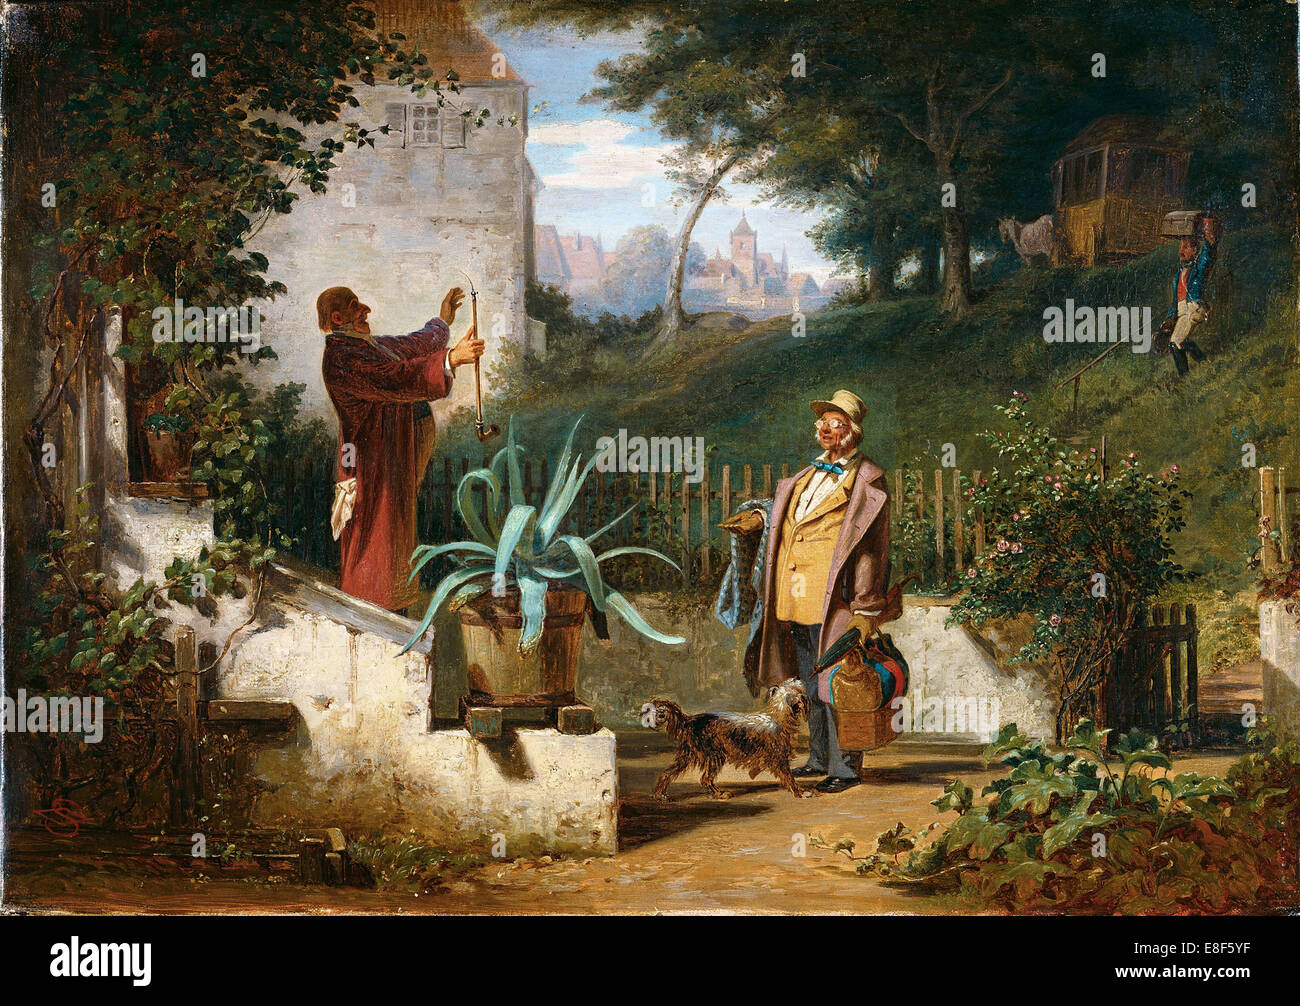 Childhood Friends. Artist: Spitzweg, Carl (1808-1885) - Stock Image